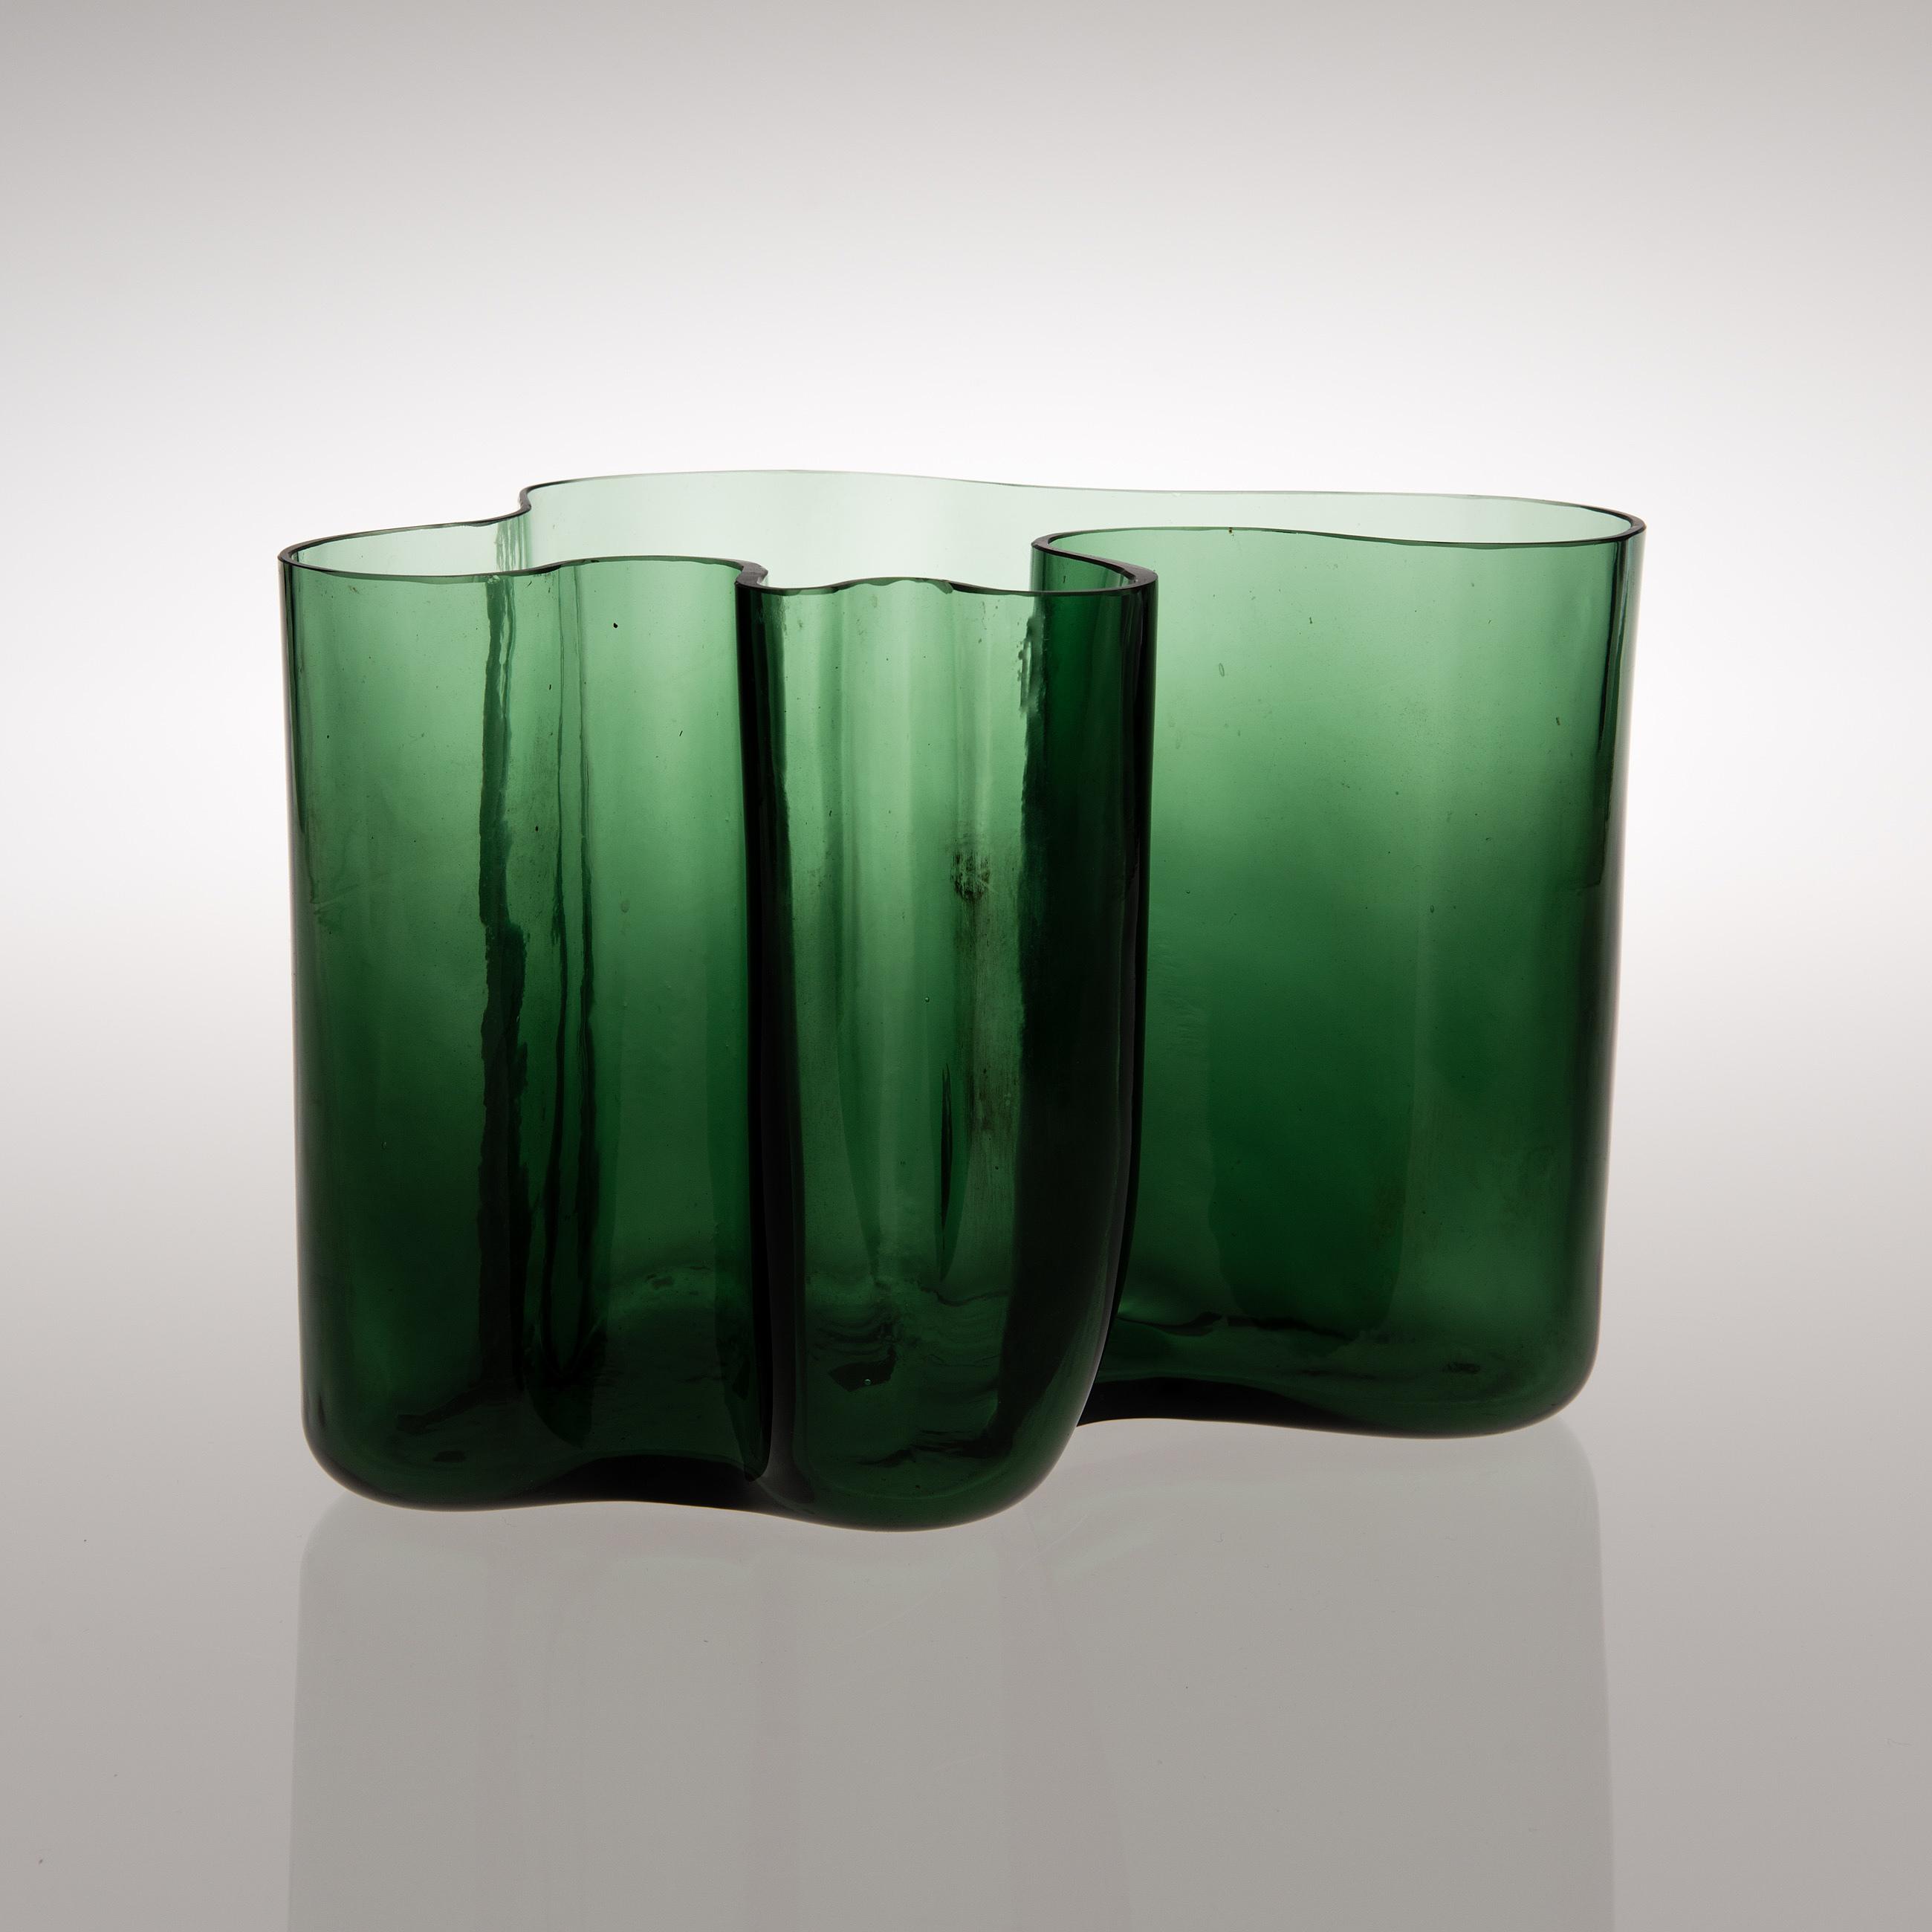 Alvar aalto a vase signed a aalto 37 karhula bukowskis 10433182 bukobject reviewsmspy